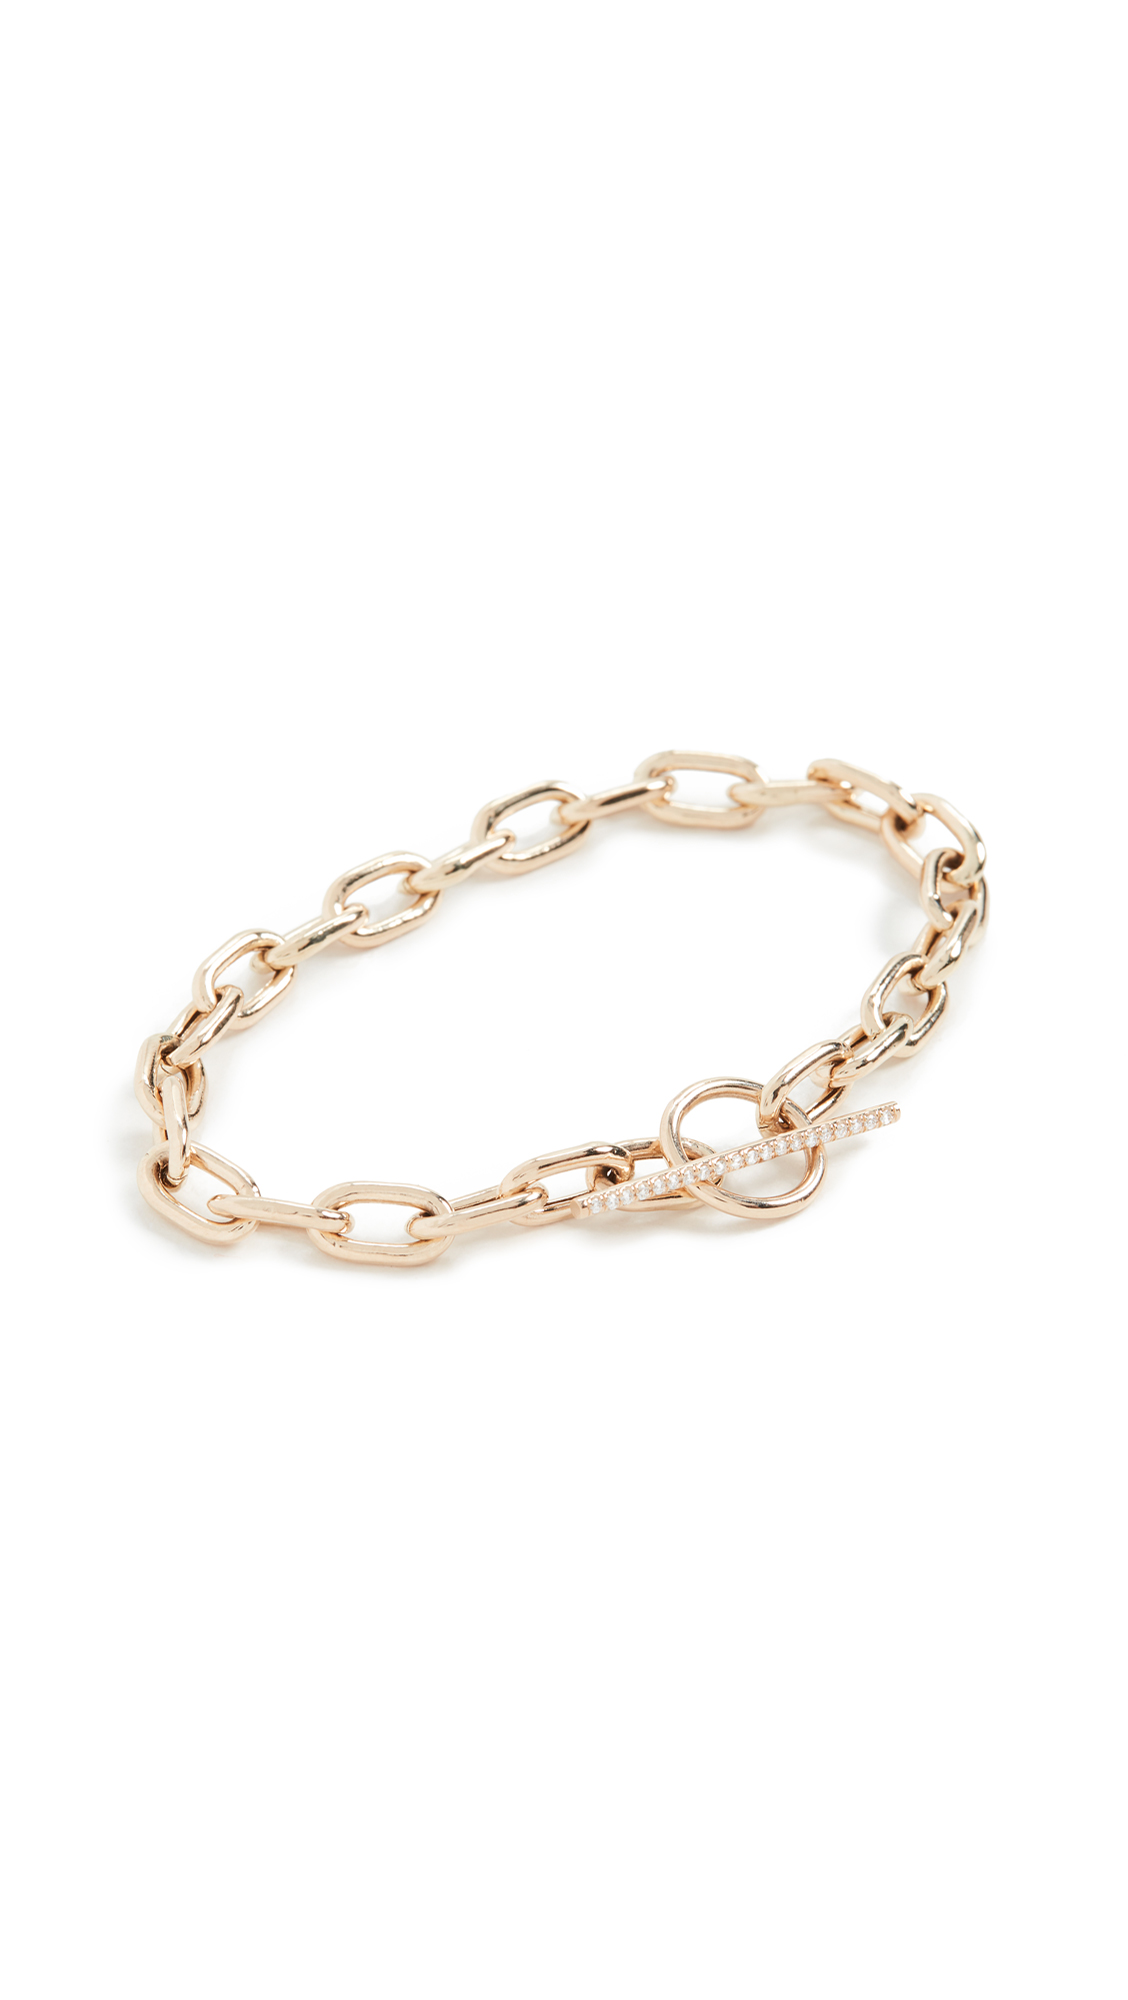 Zoe Chicco 14k Gold Extra Large Square Oval Link Bracelet